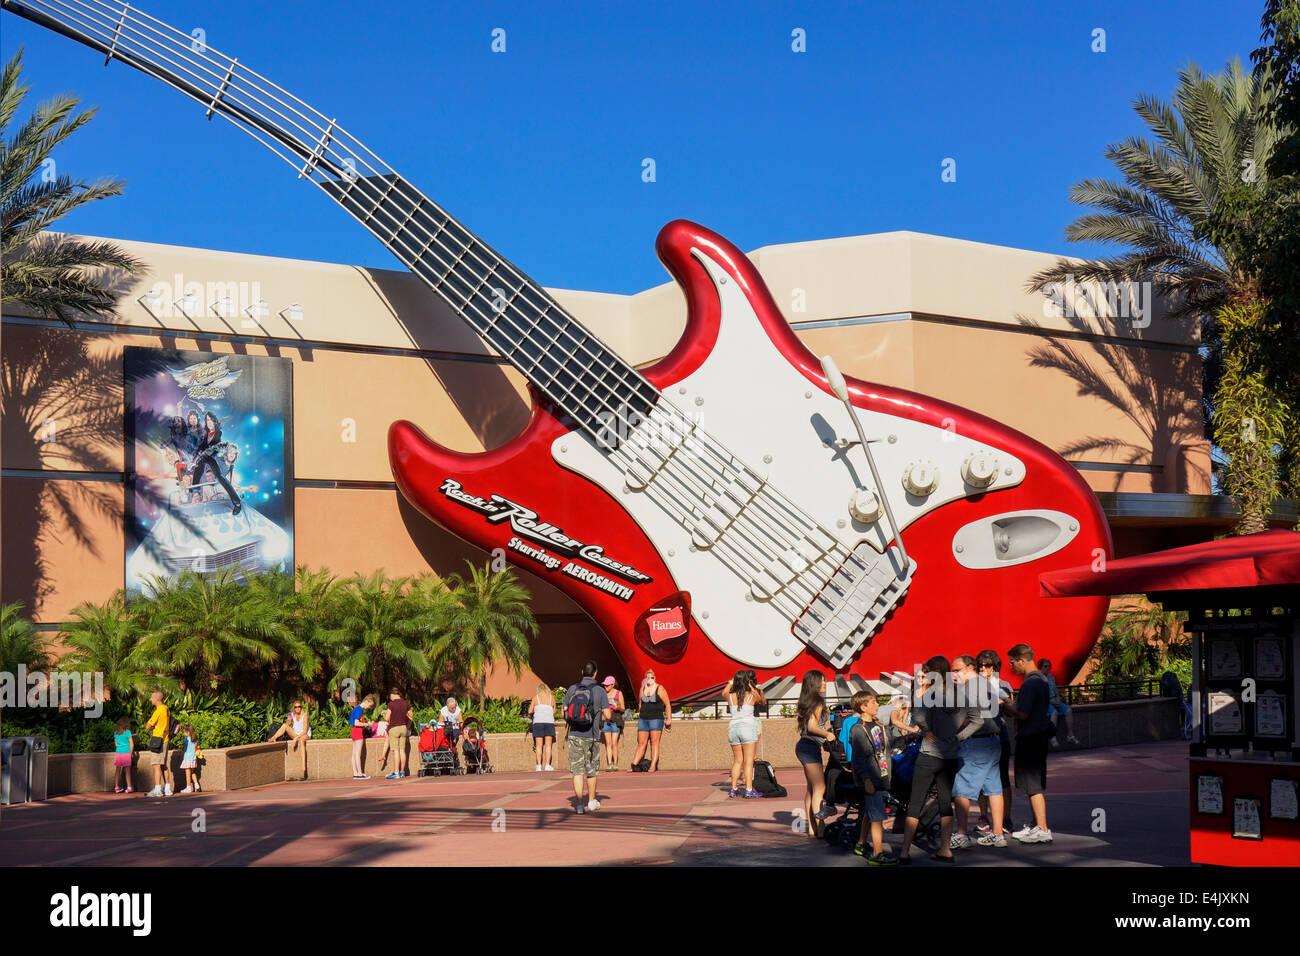 Rock N Roller Coaster Aerosmith, Guitar, at Hollywood Studios, Disney Stock Photo: 71716169 - Alamy